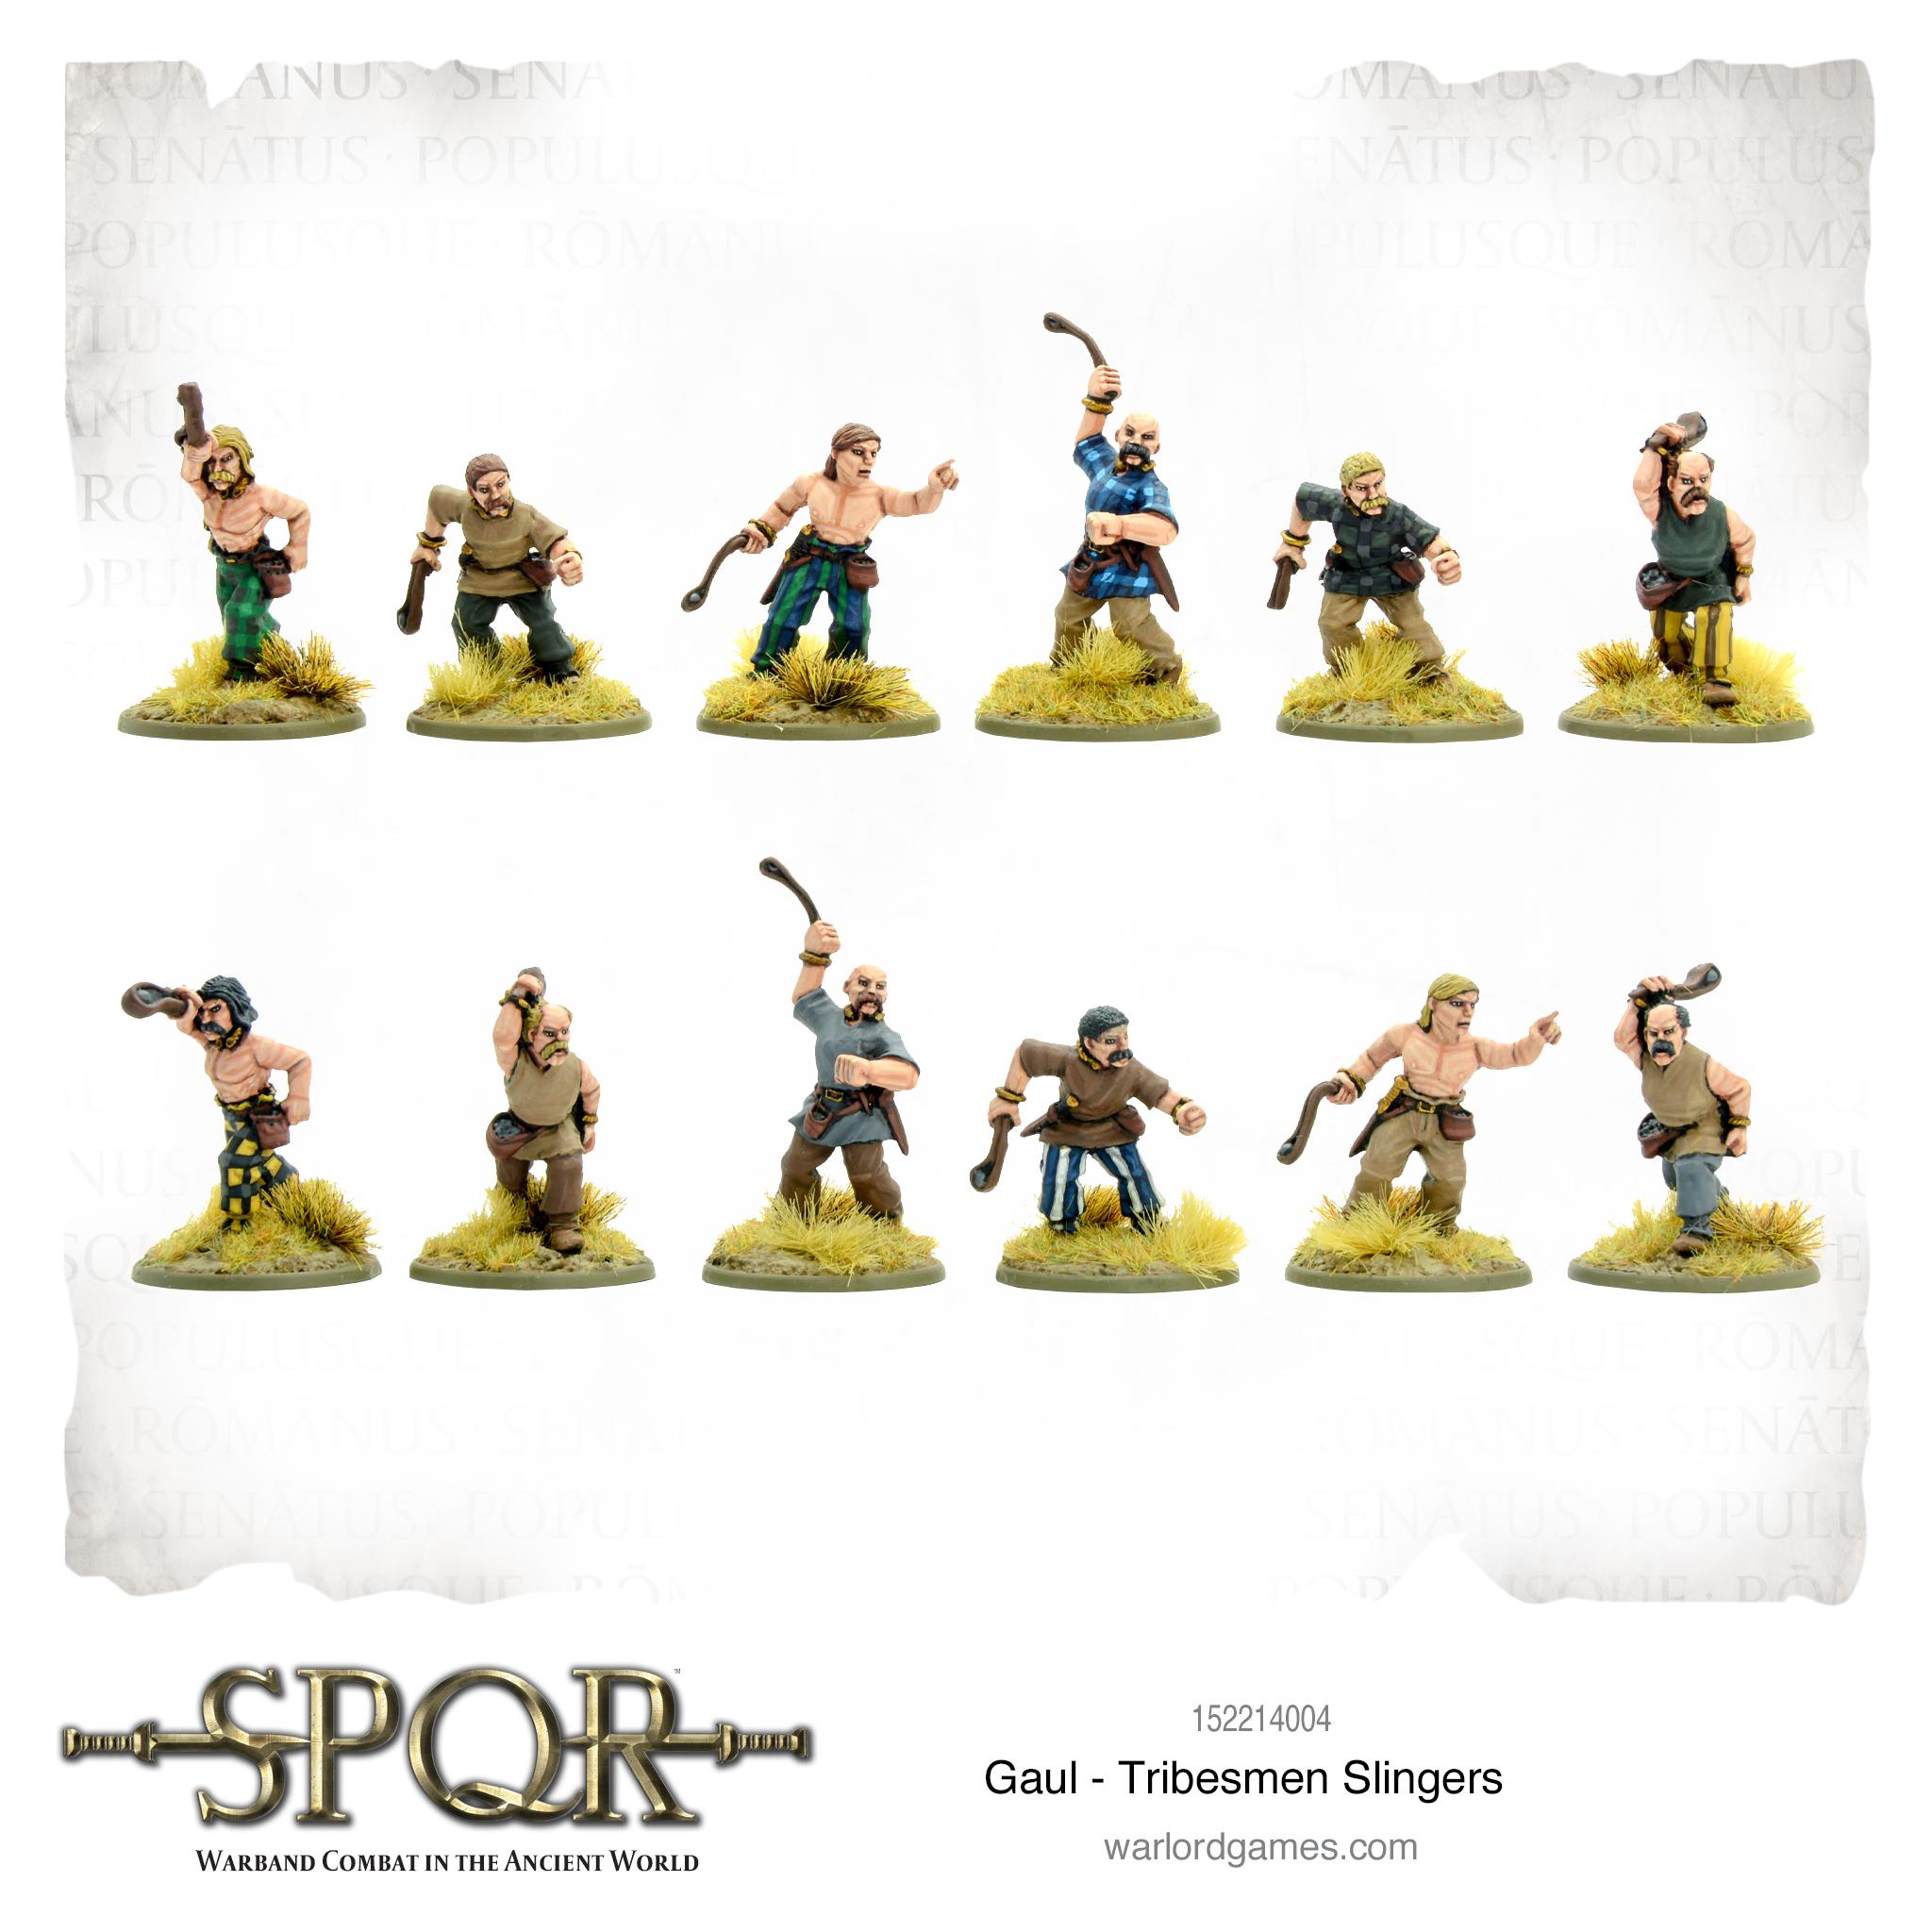 Gaul Tribesmen SLingers